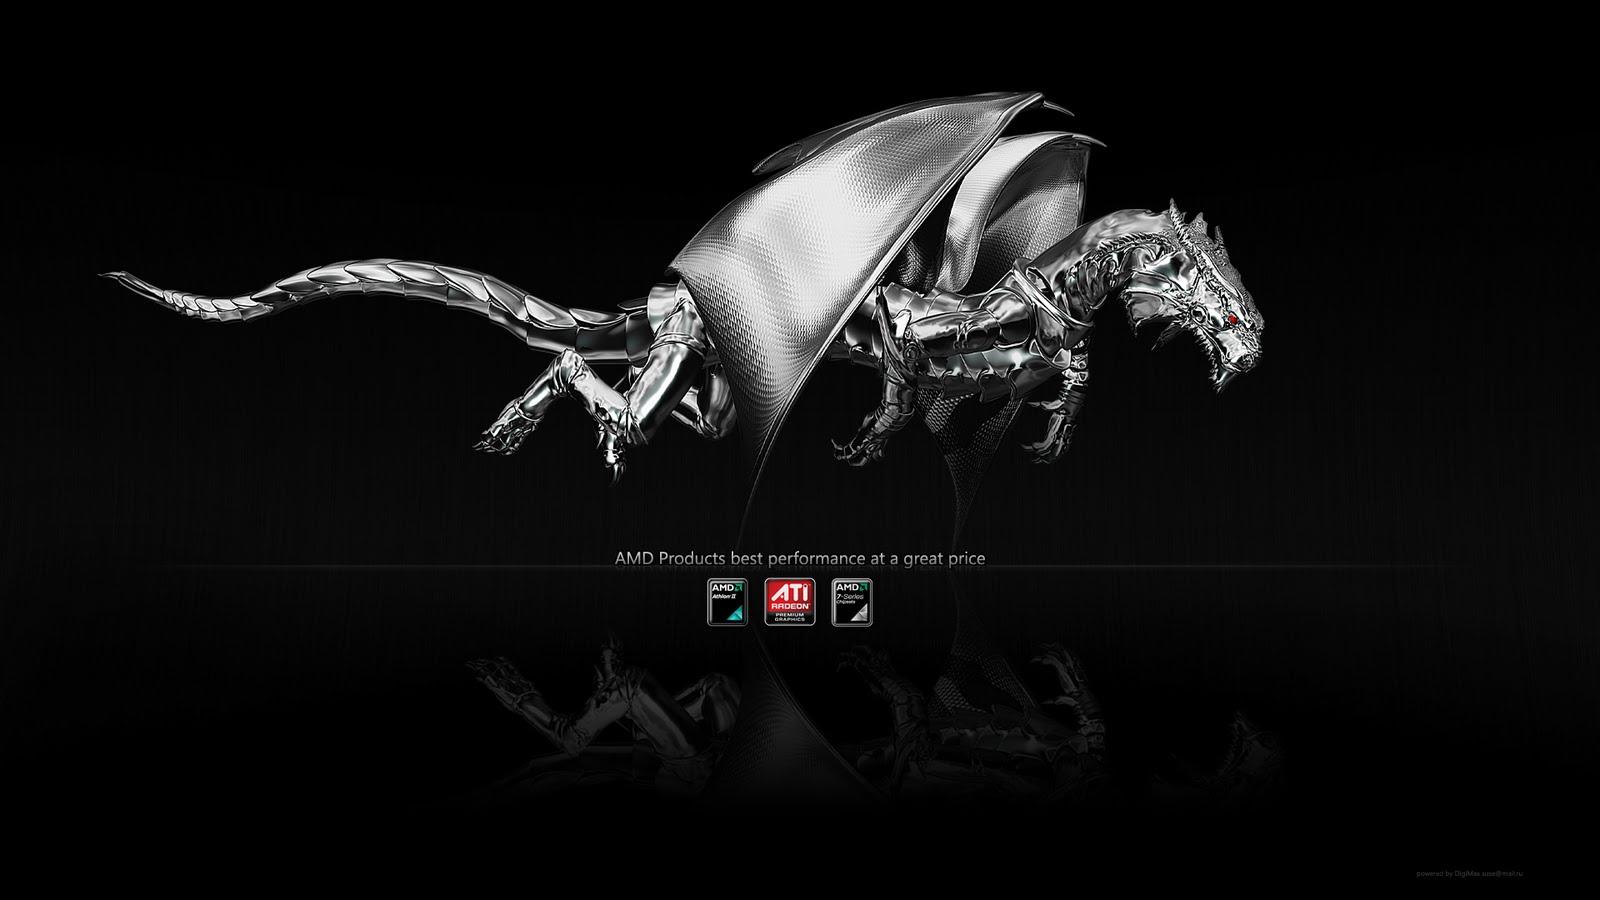 3D Animated Dragon Wallpaper 1600x900